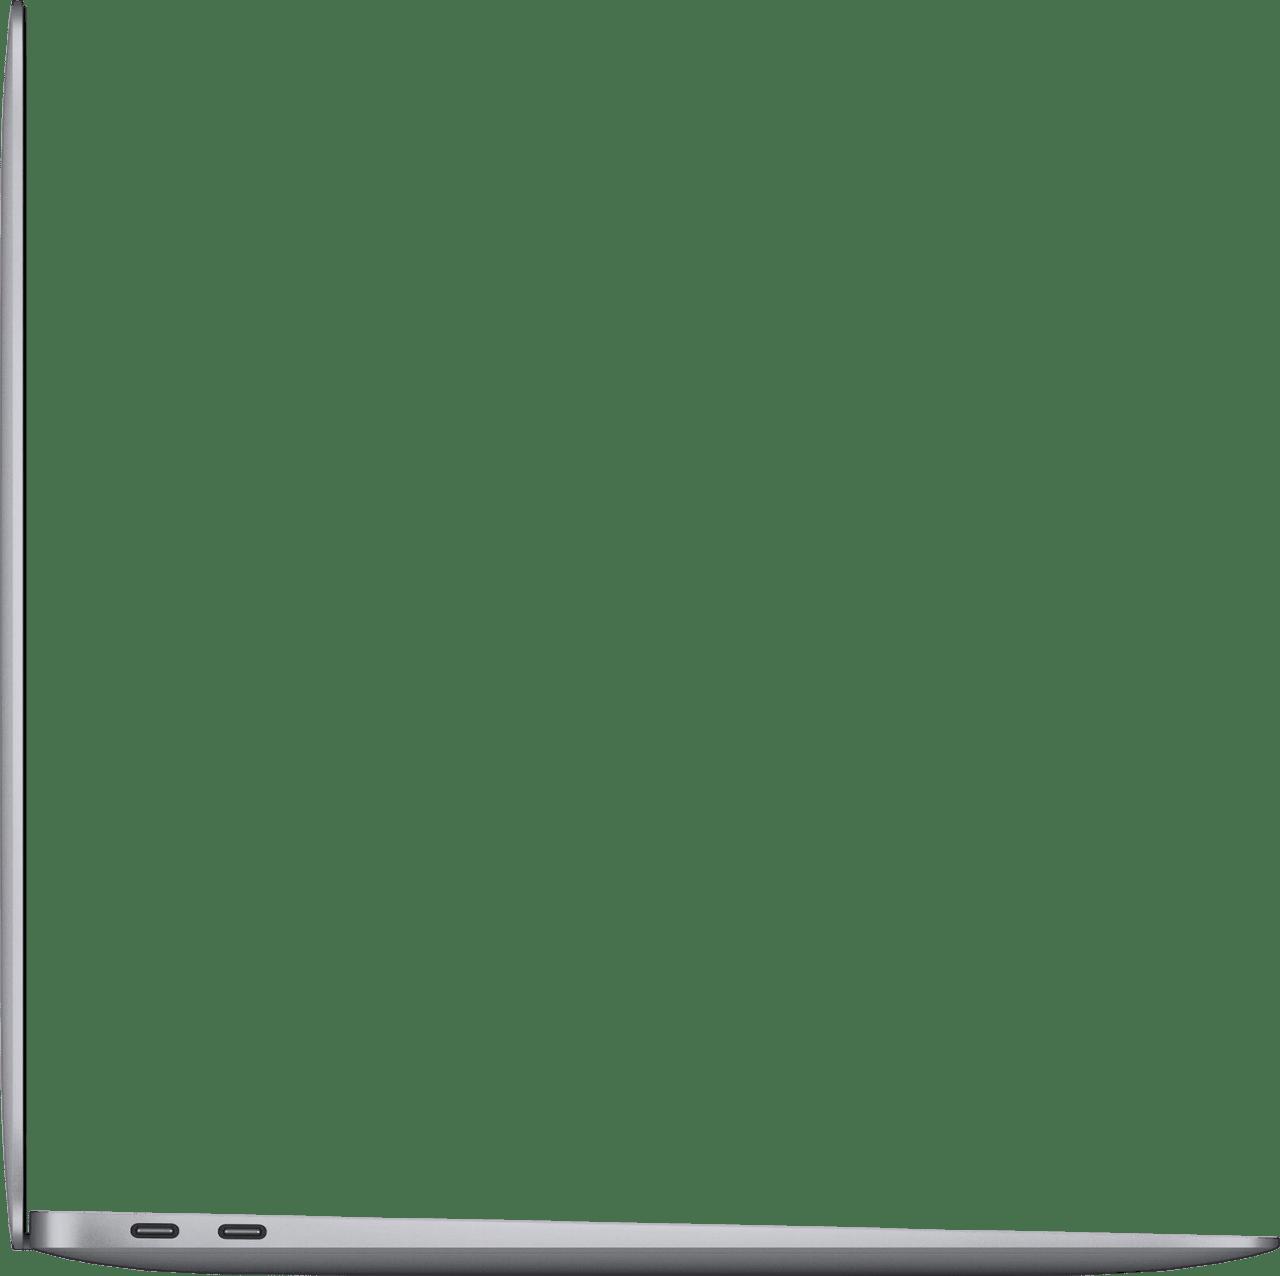 Space Grey Apple MacBook Air (Late 2020) Laptop - Apple M1 - 8GB - 512GB SSD - Apple Integrated 8-core GPU.3